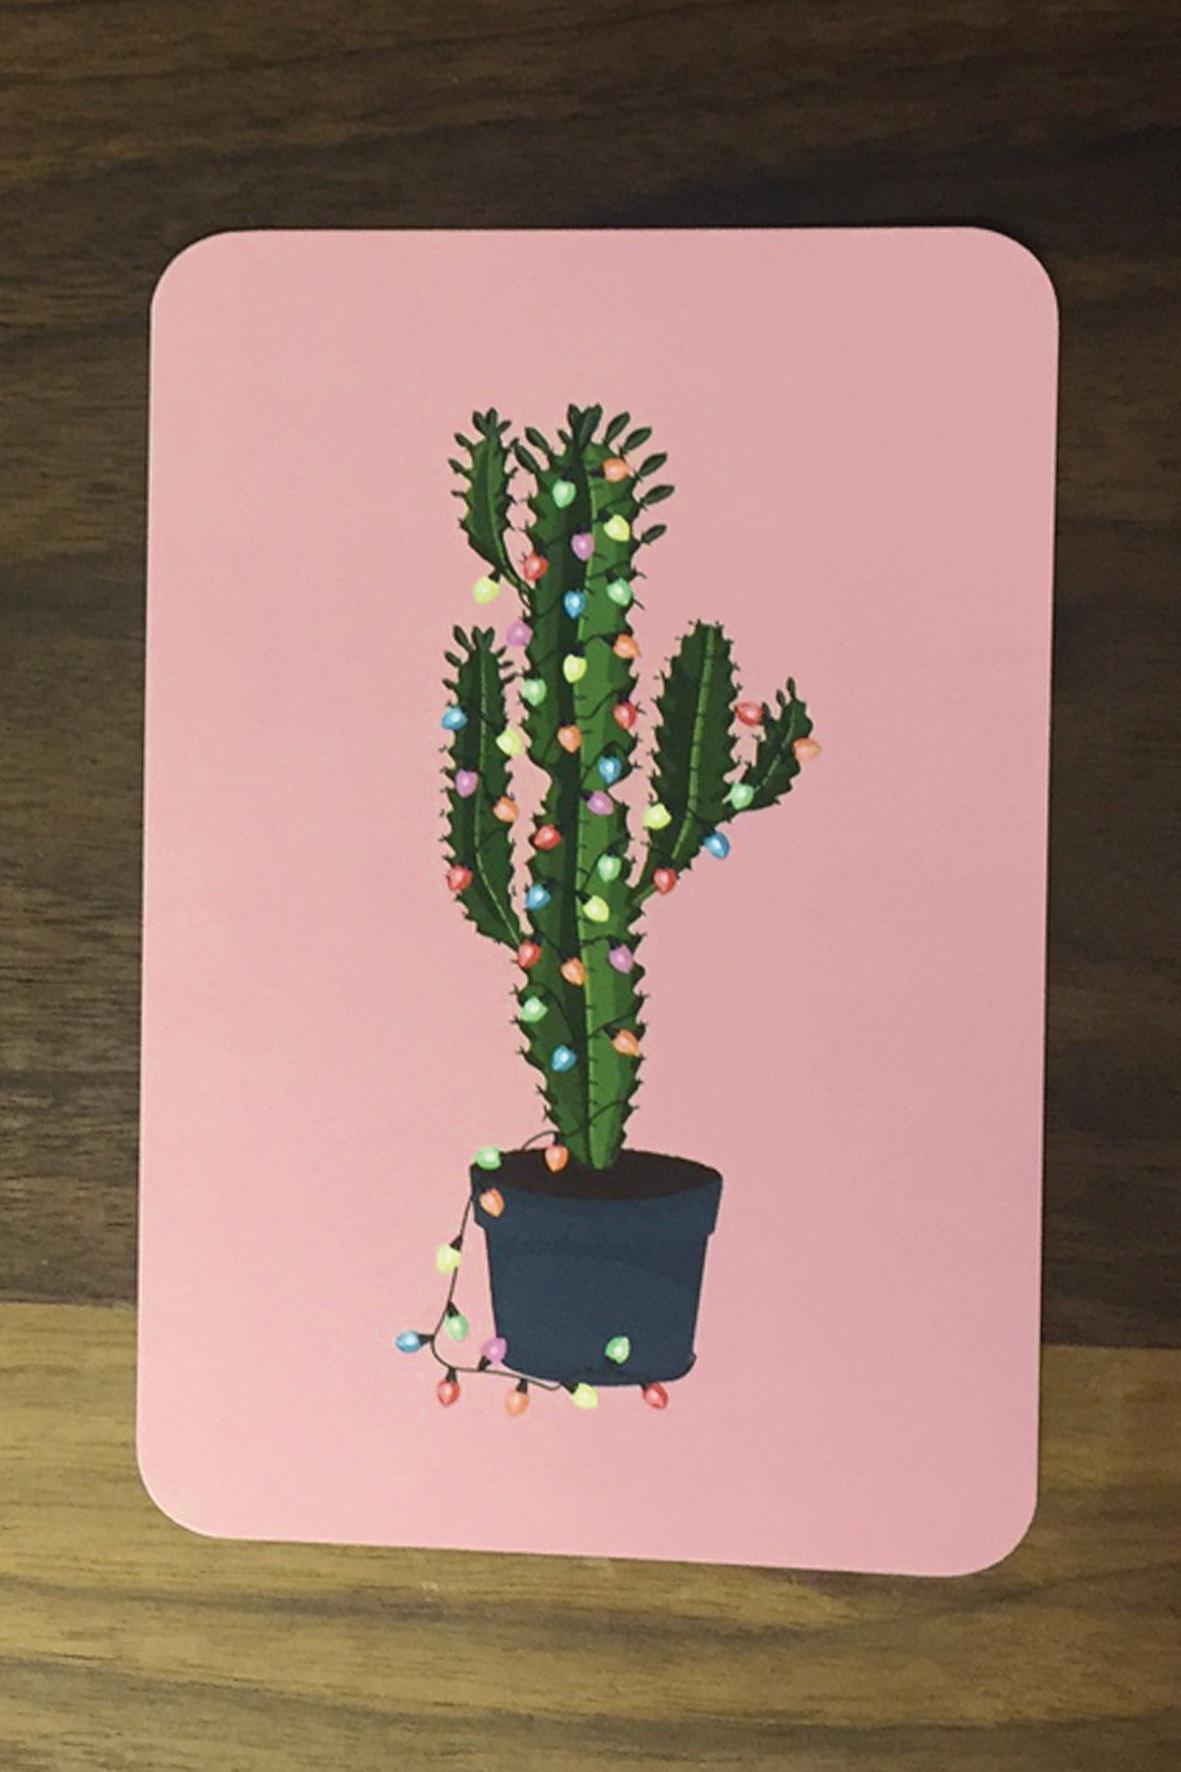 kort-kaktus-vefur.jpg